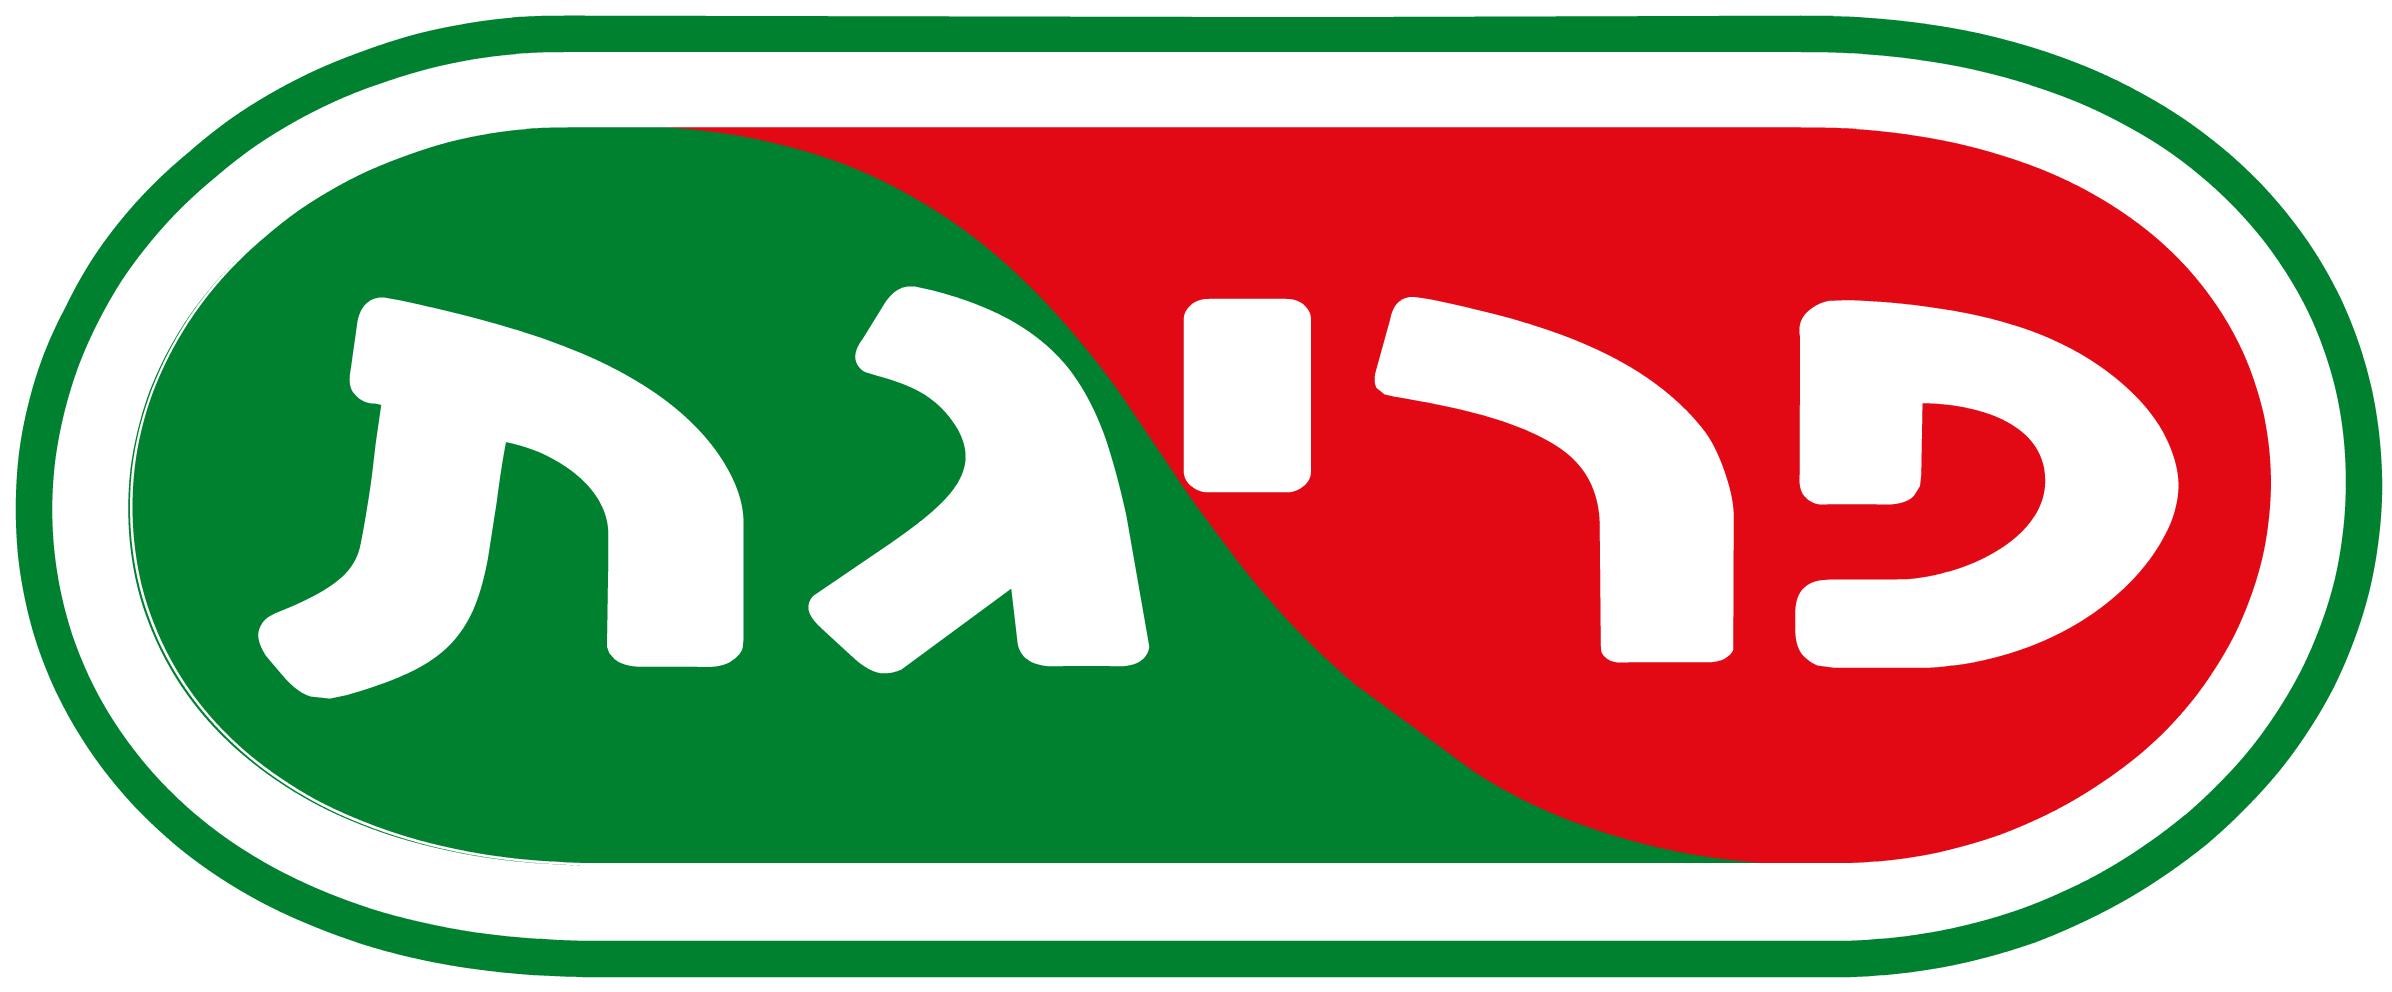 prigat-logo